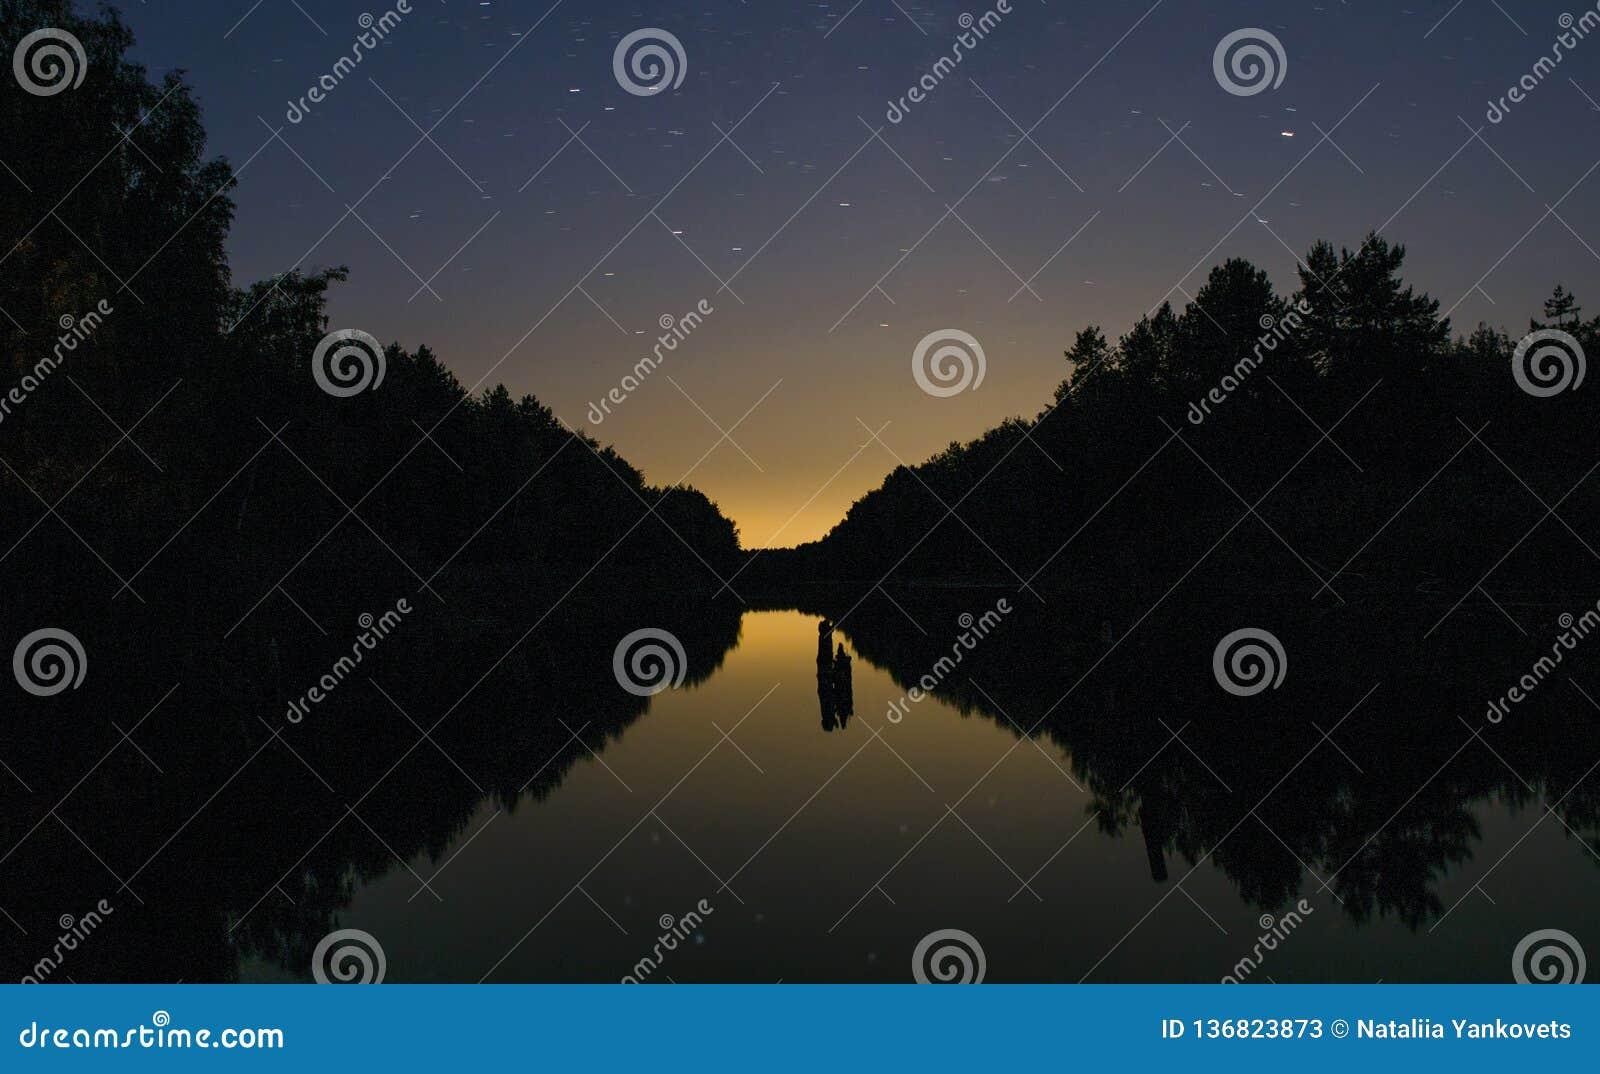 Heldere zonsondergang amid donkere hemel boven de Rivier in het bos